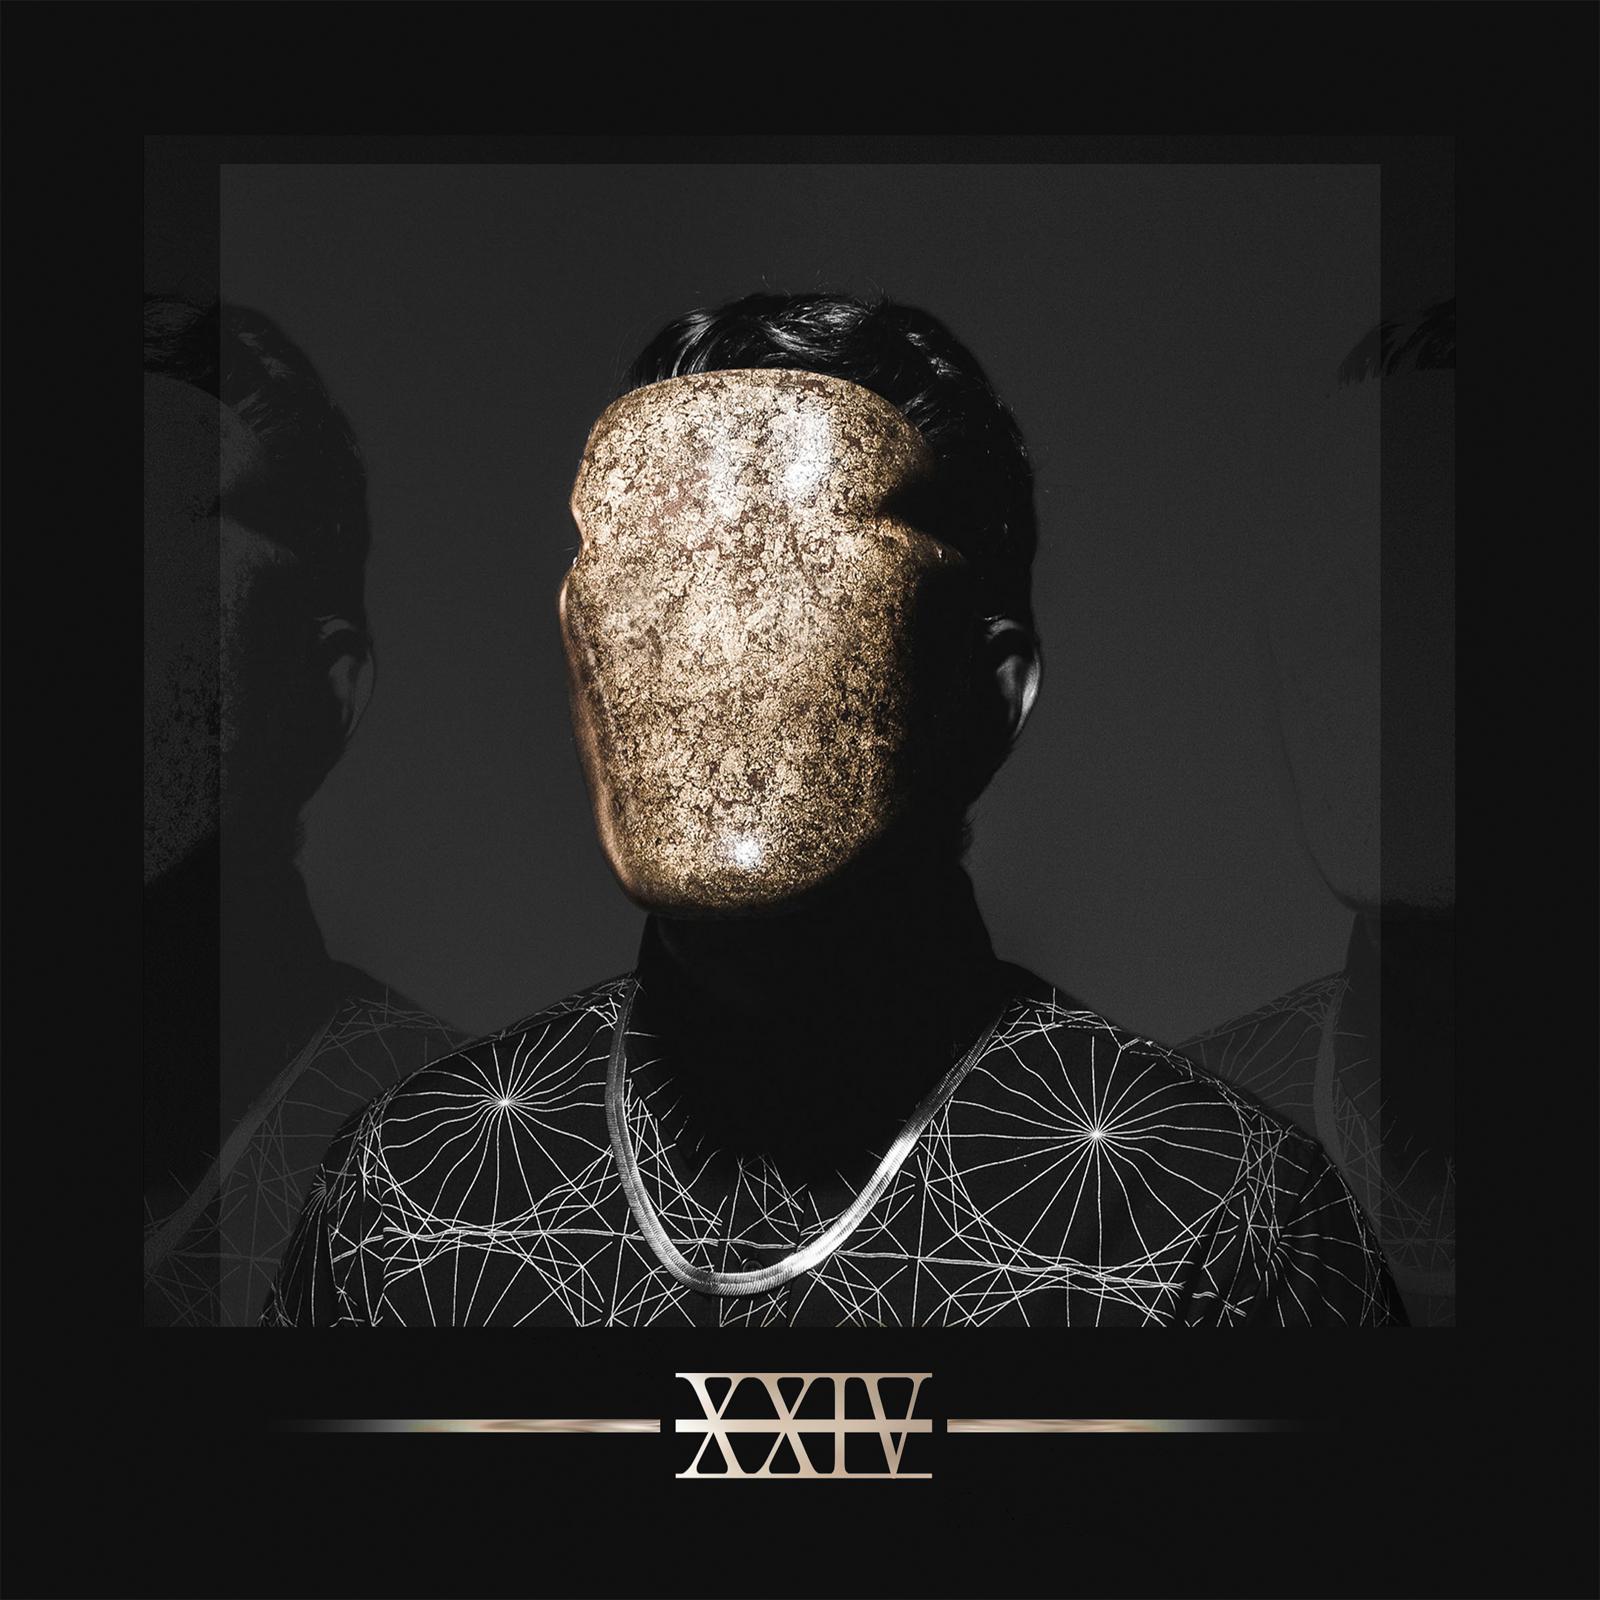 Soundcloud-art-XXIV.jpg